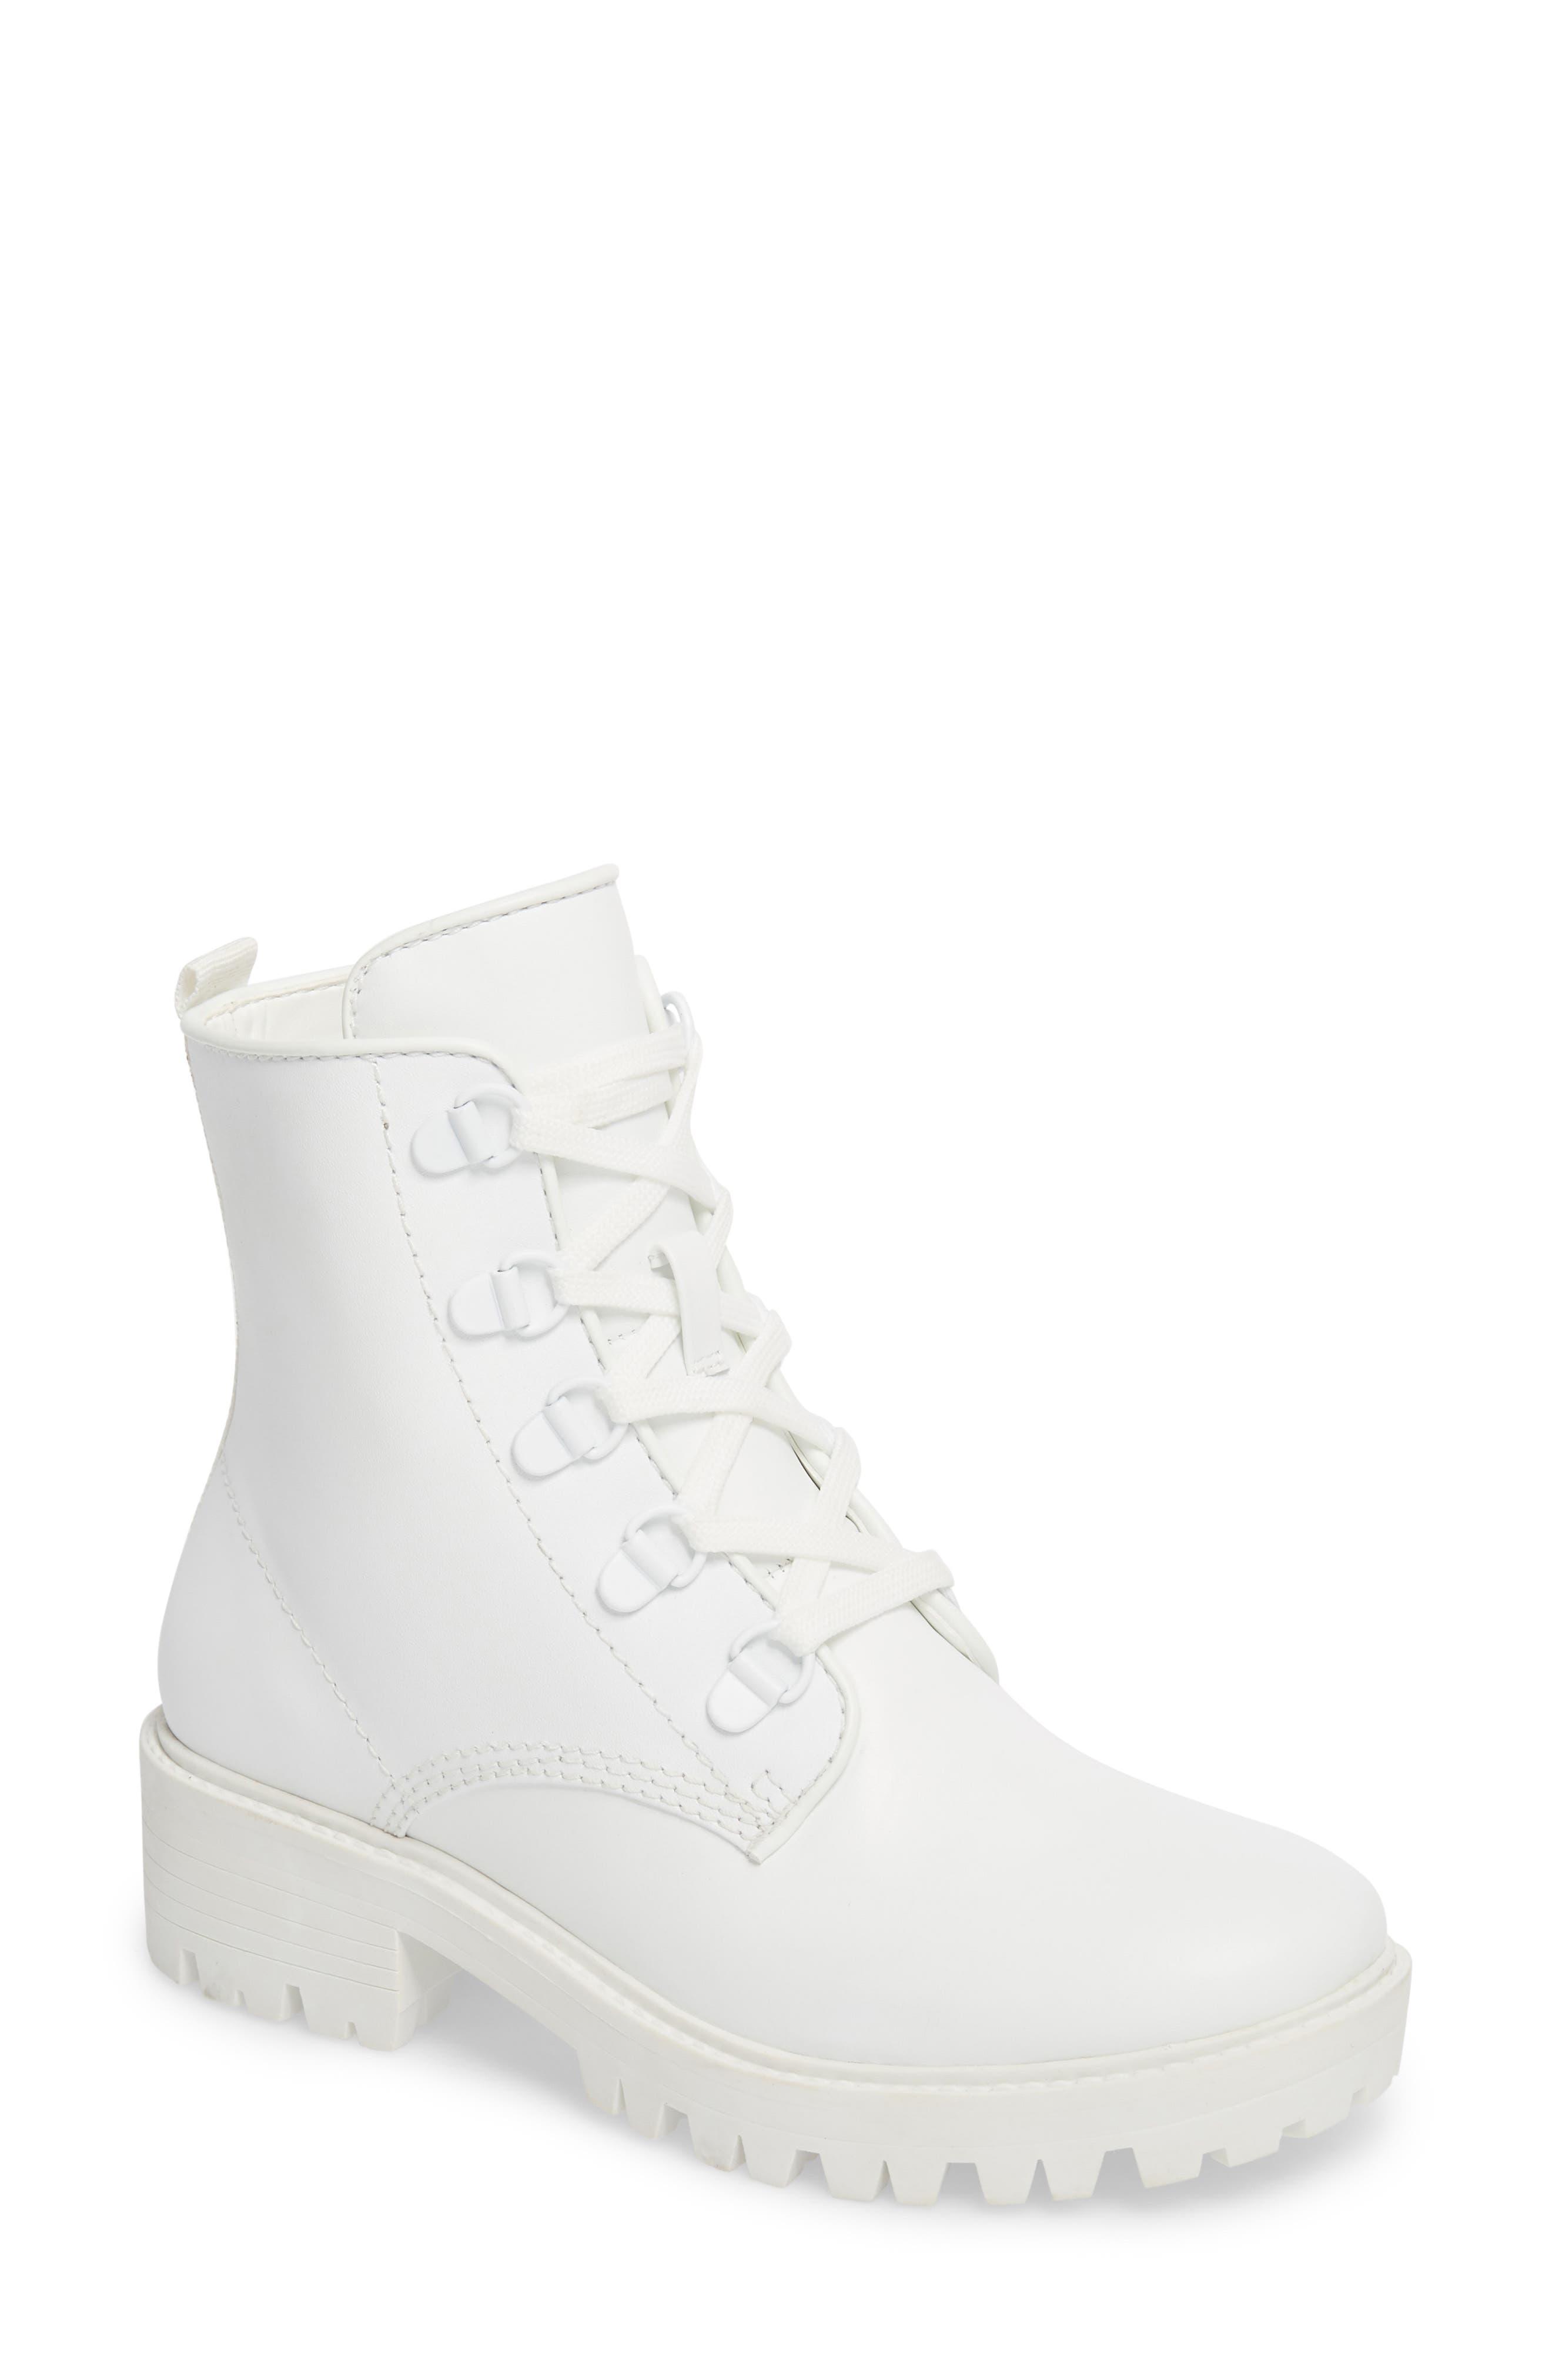 Military Boot,                             Main thumbnail 1, color,                             White/ White/ White